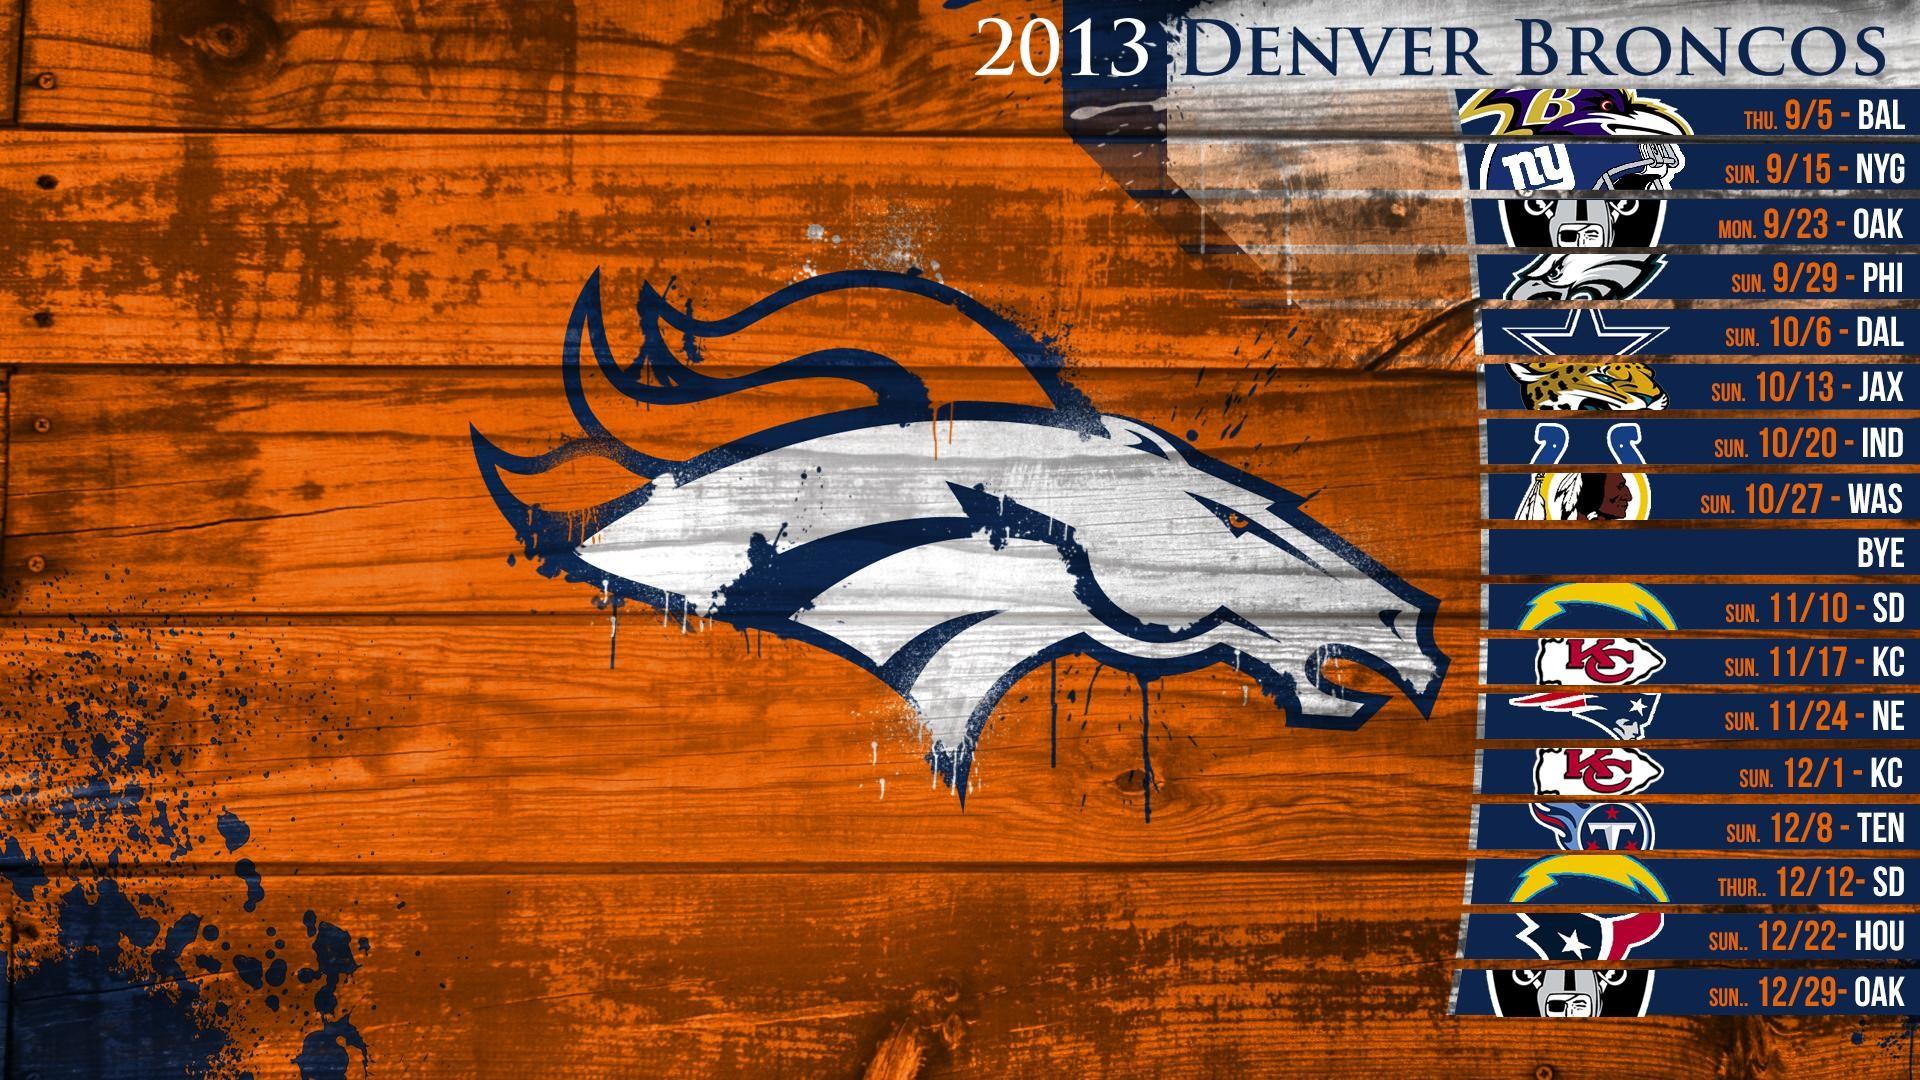 Res: 1920x1080, Broncos Wallpaper 2013